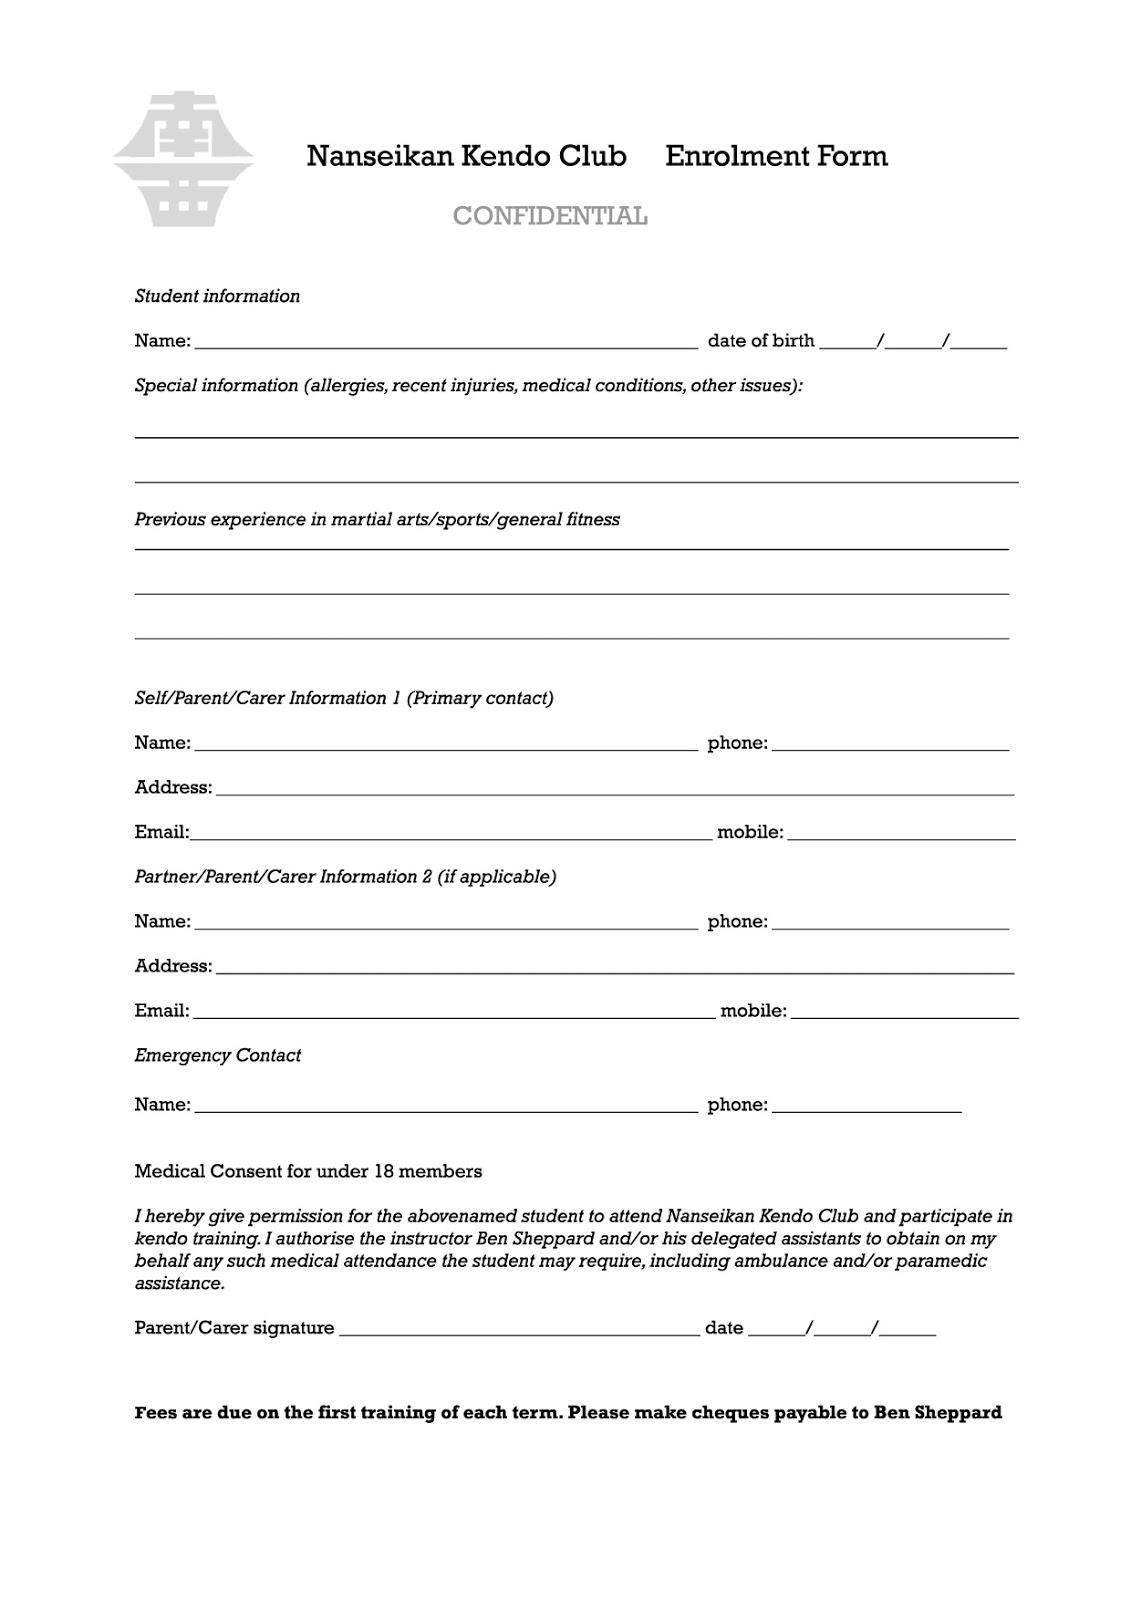 Enrolment Form Template Free Christmas Card Email Templates NSK Enrolment  Form 2013 Enrolment Form Templatehtml  Enrolment Form Template